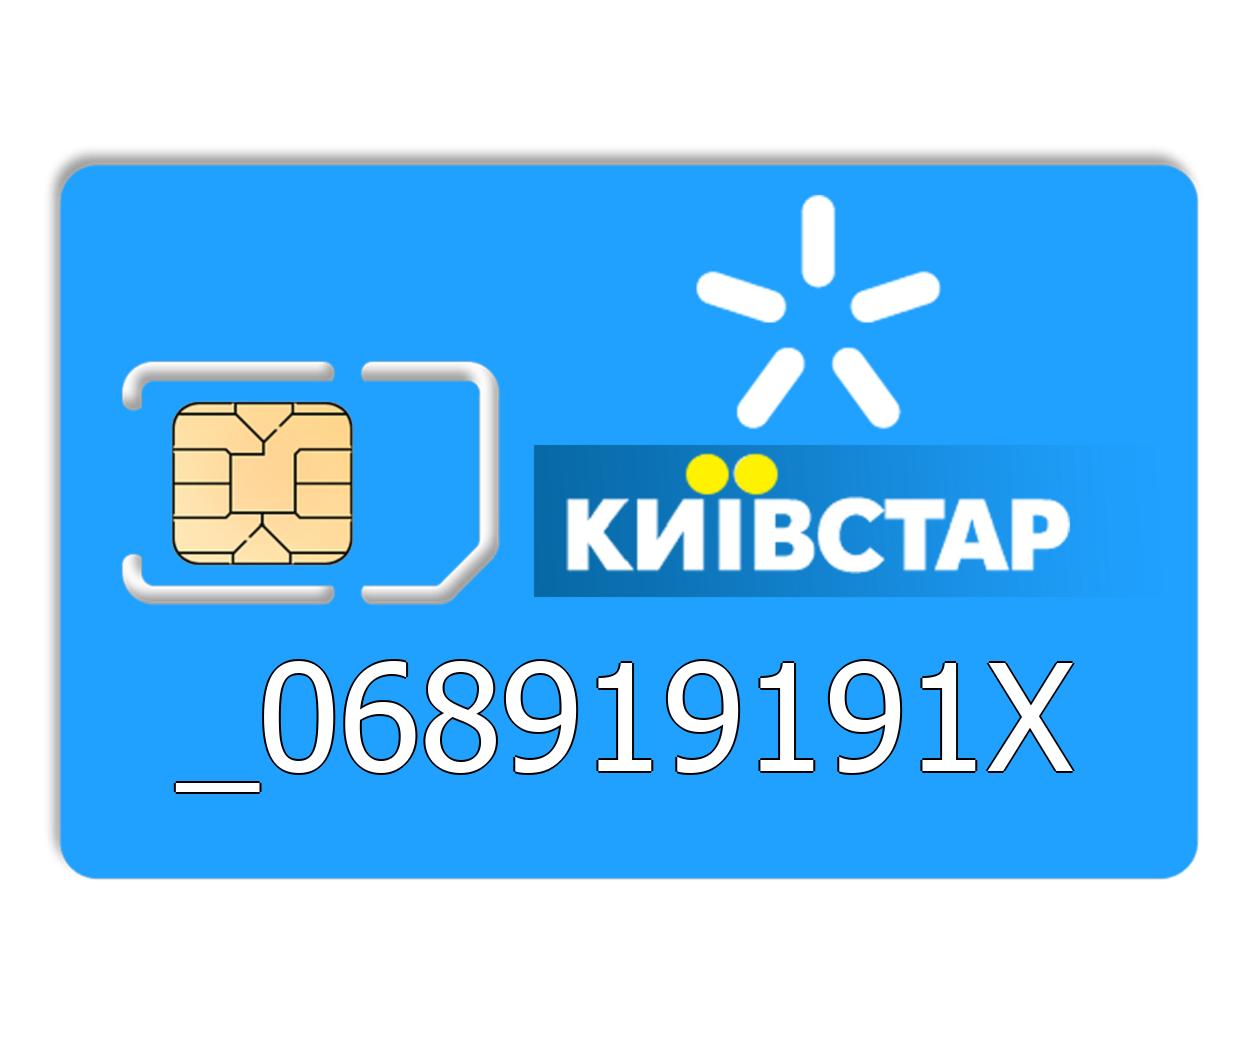 Красивий номер Київстар 068919191X